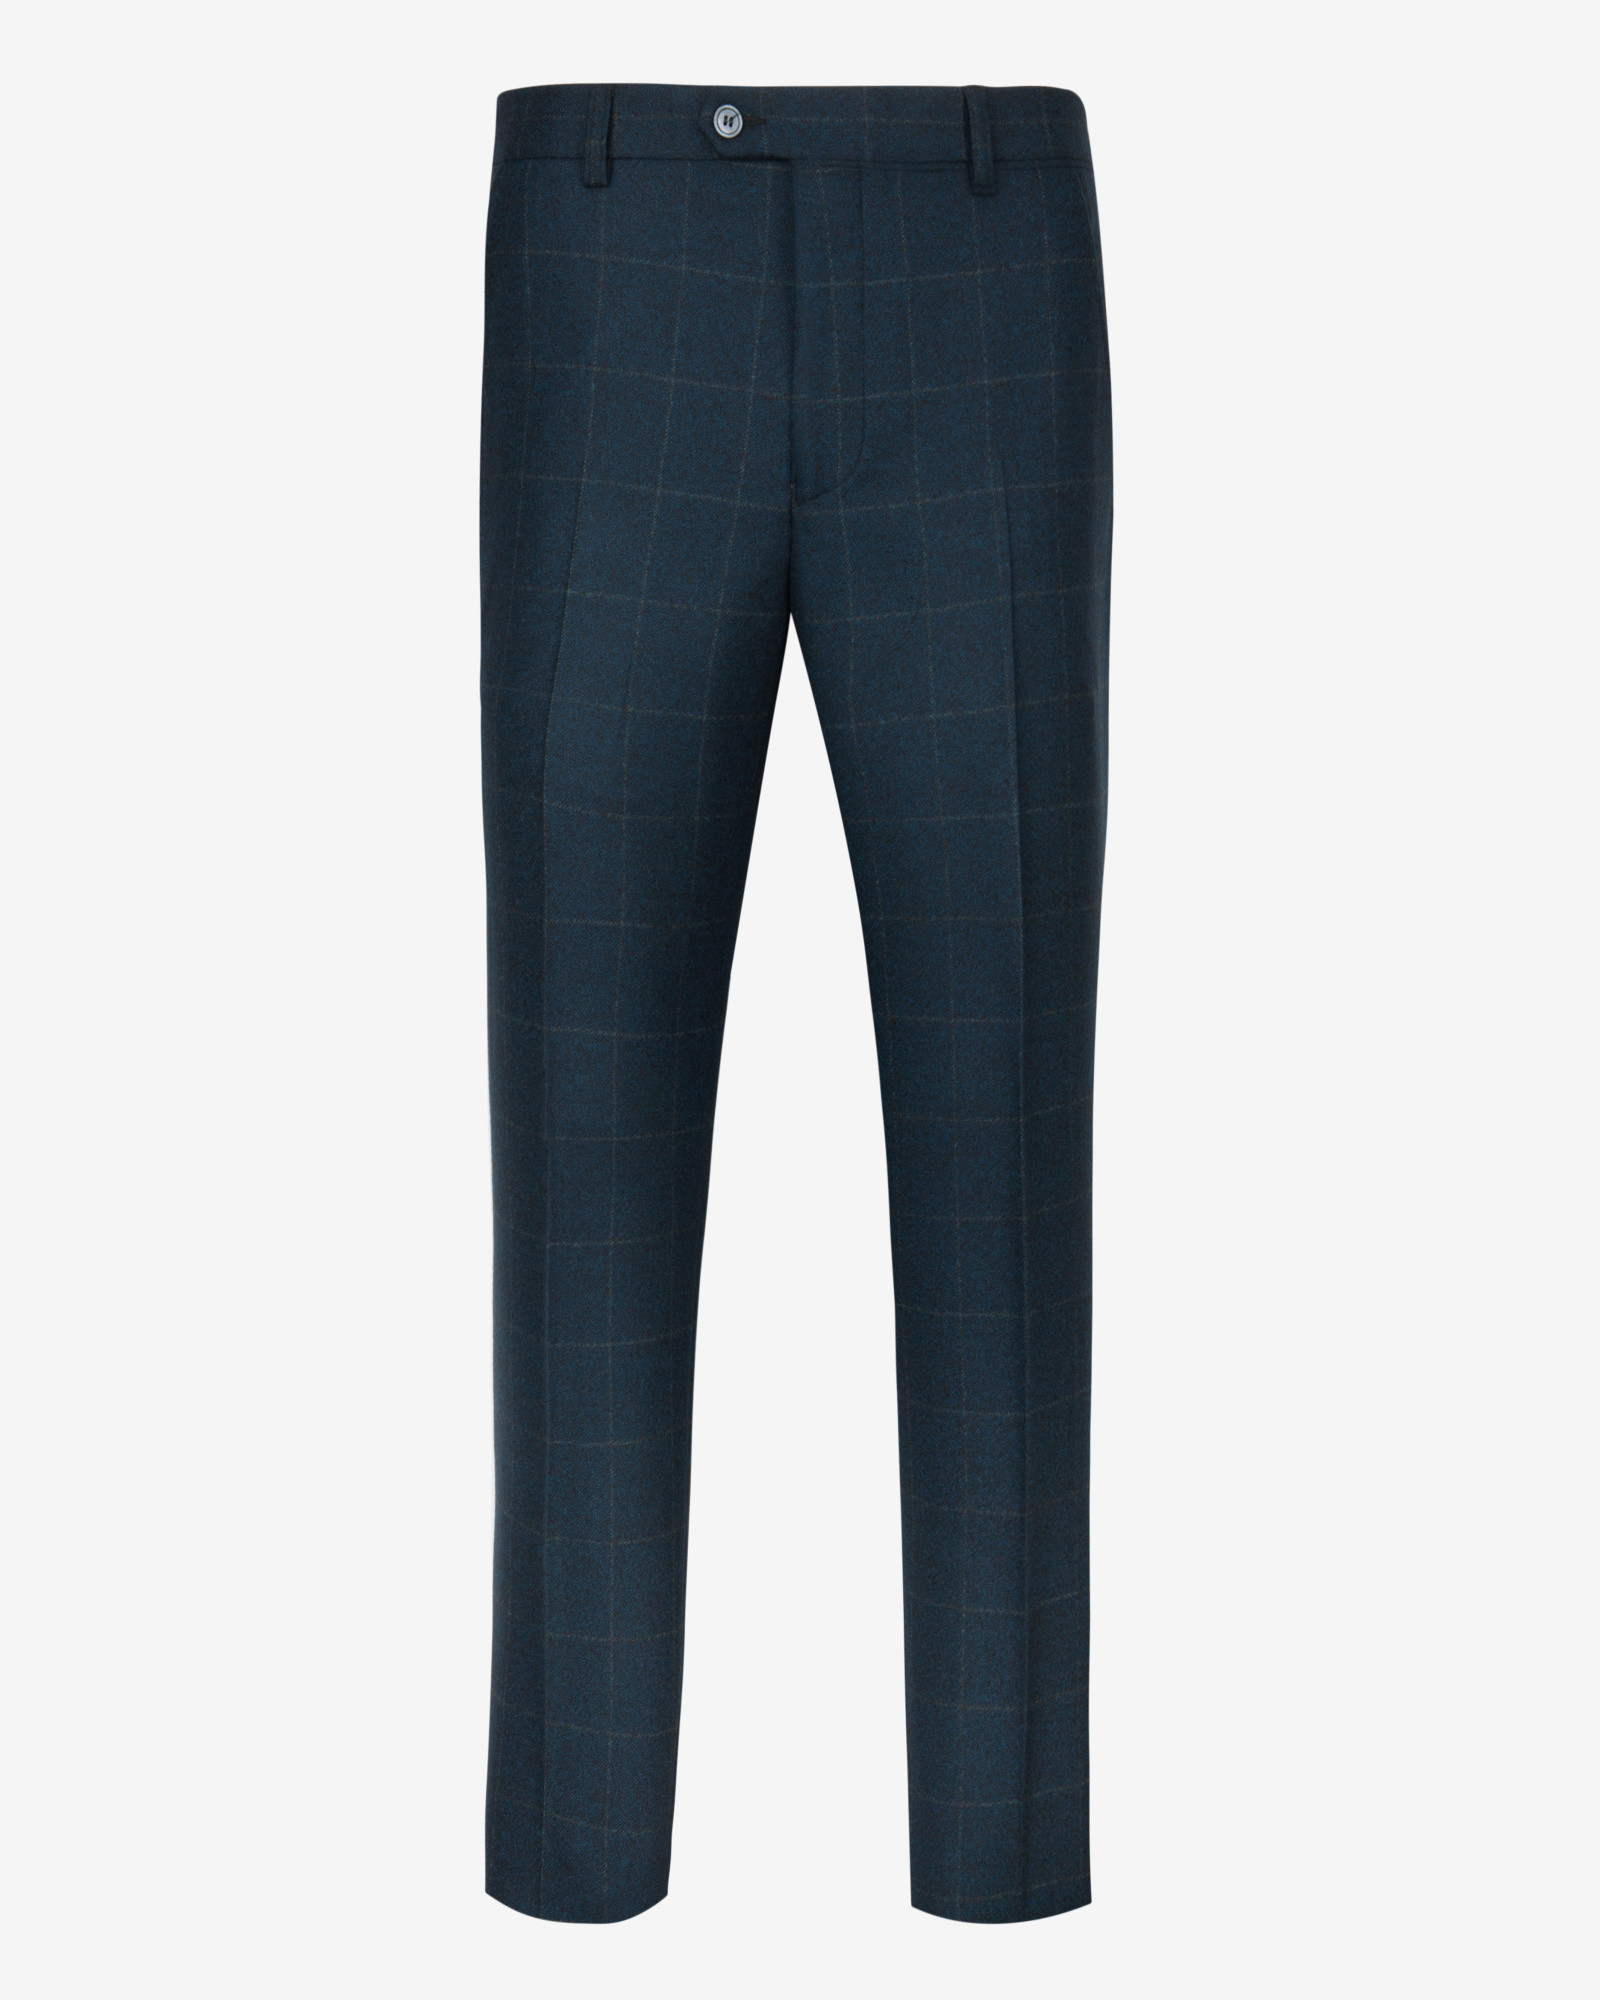 Debonair Checked Wool Suit Trousers Ted Baker Largest Supplier For Sale 8H8QzENl